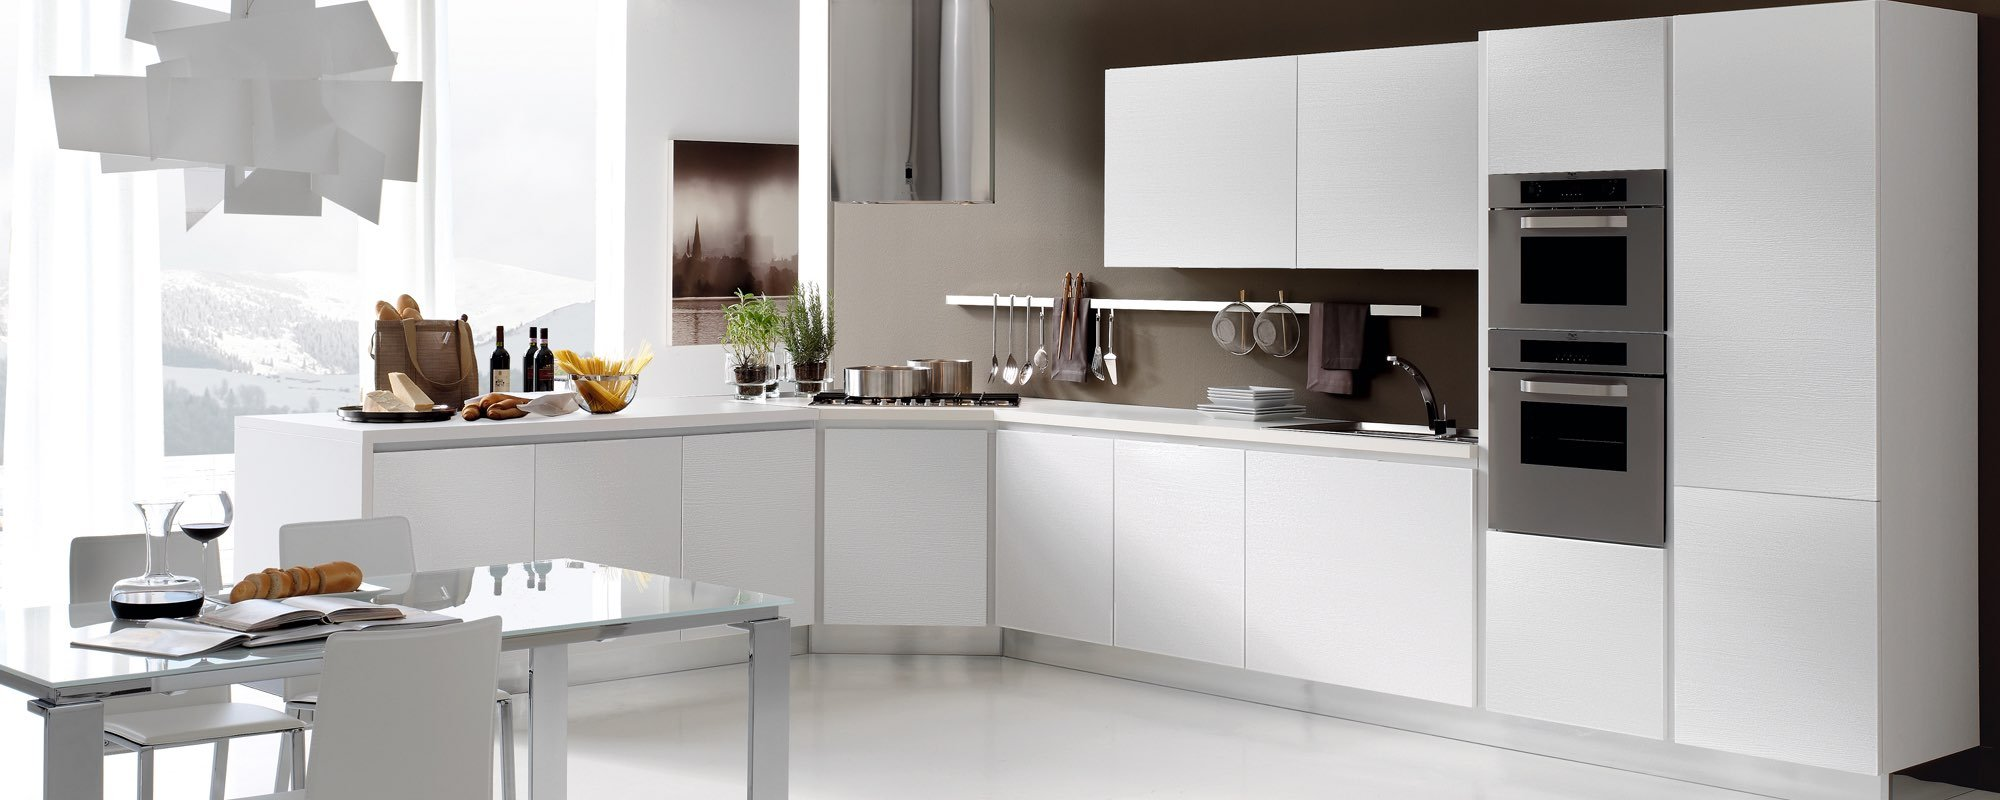 cucina moderna bianca con tavolo e sedie -Life